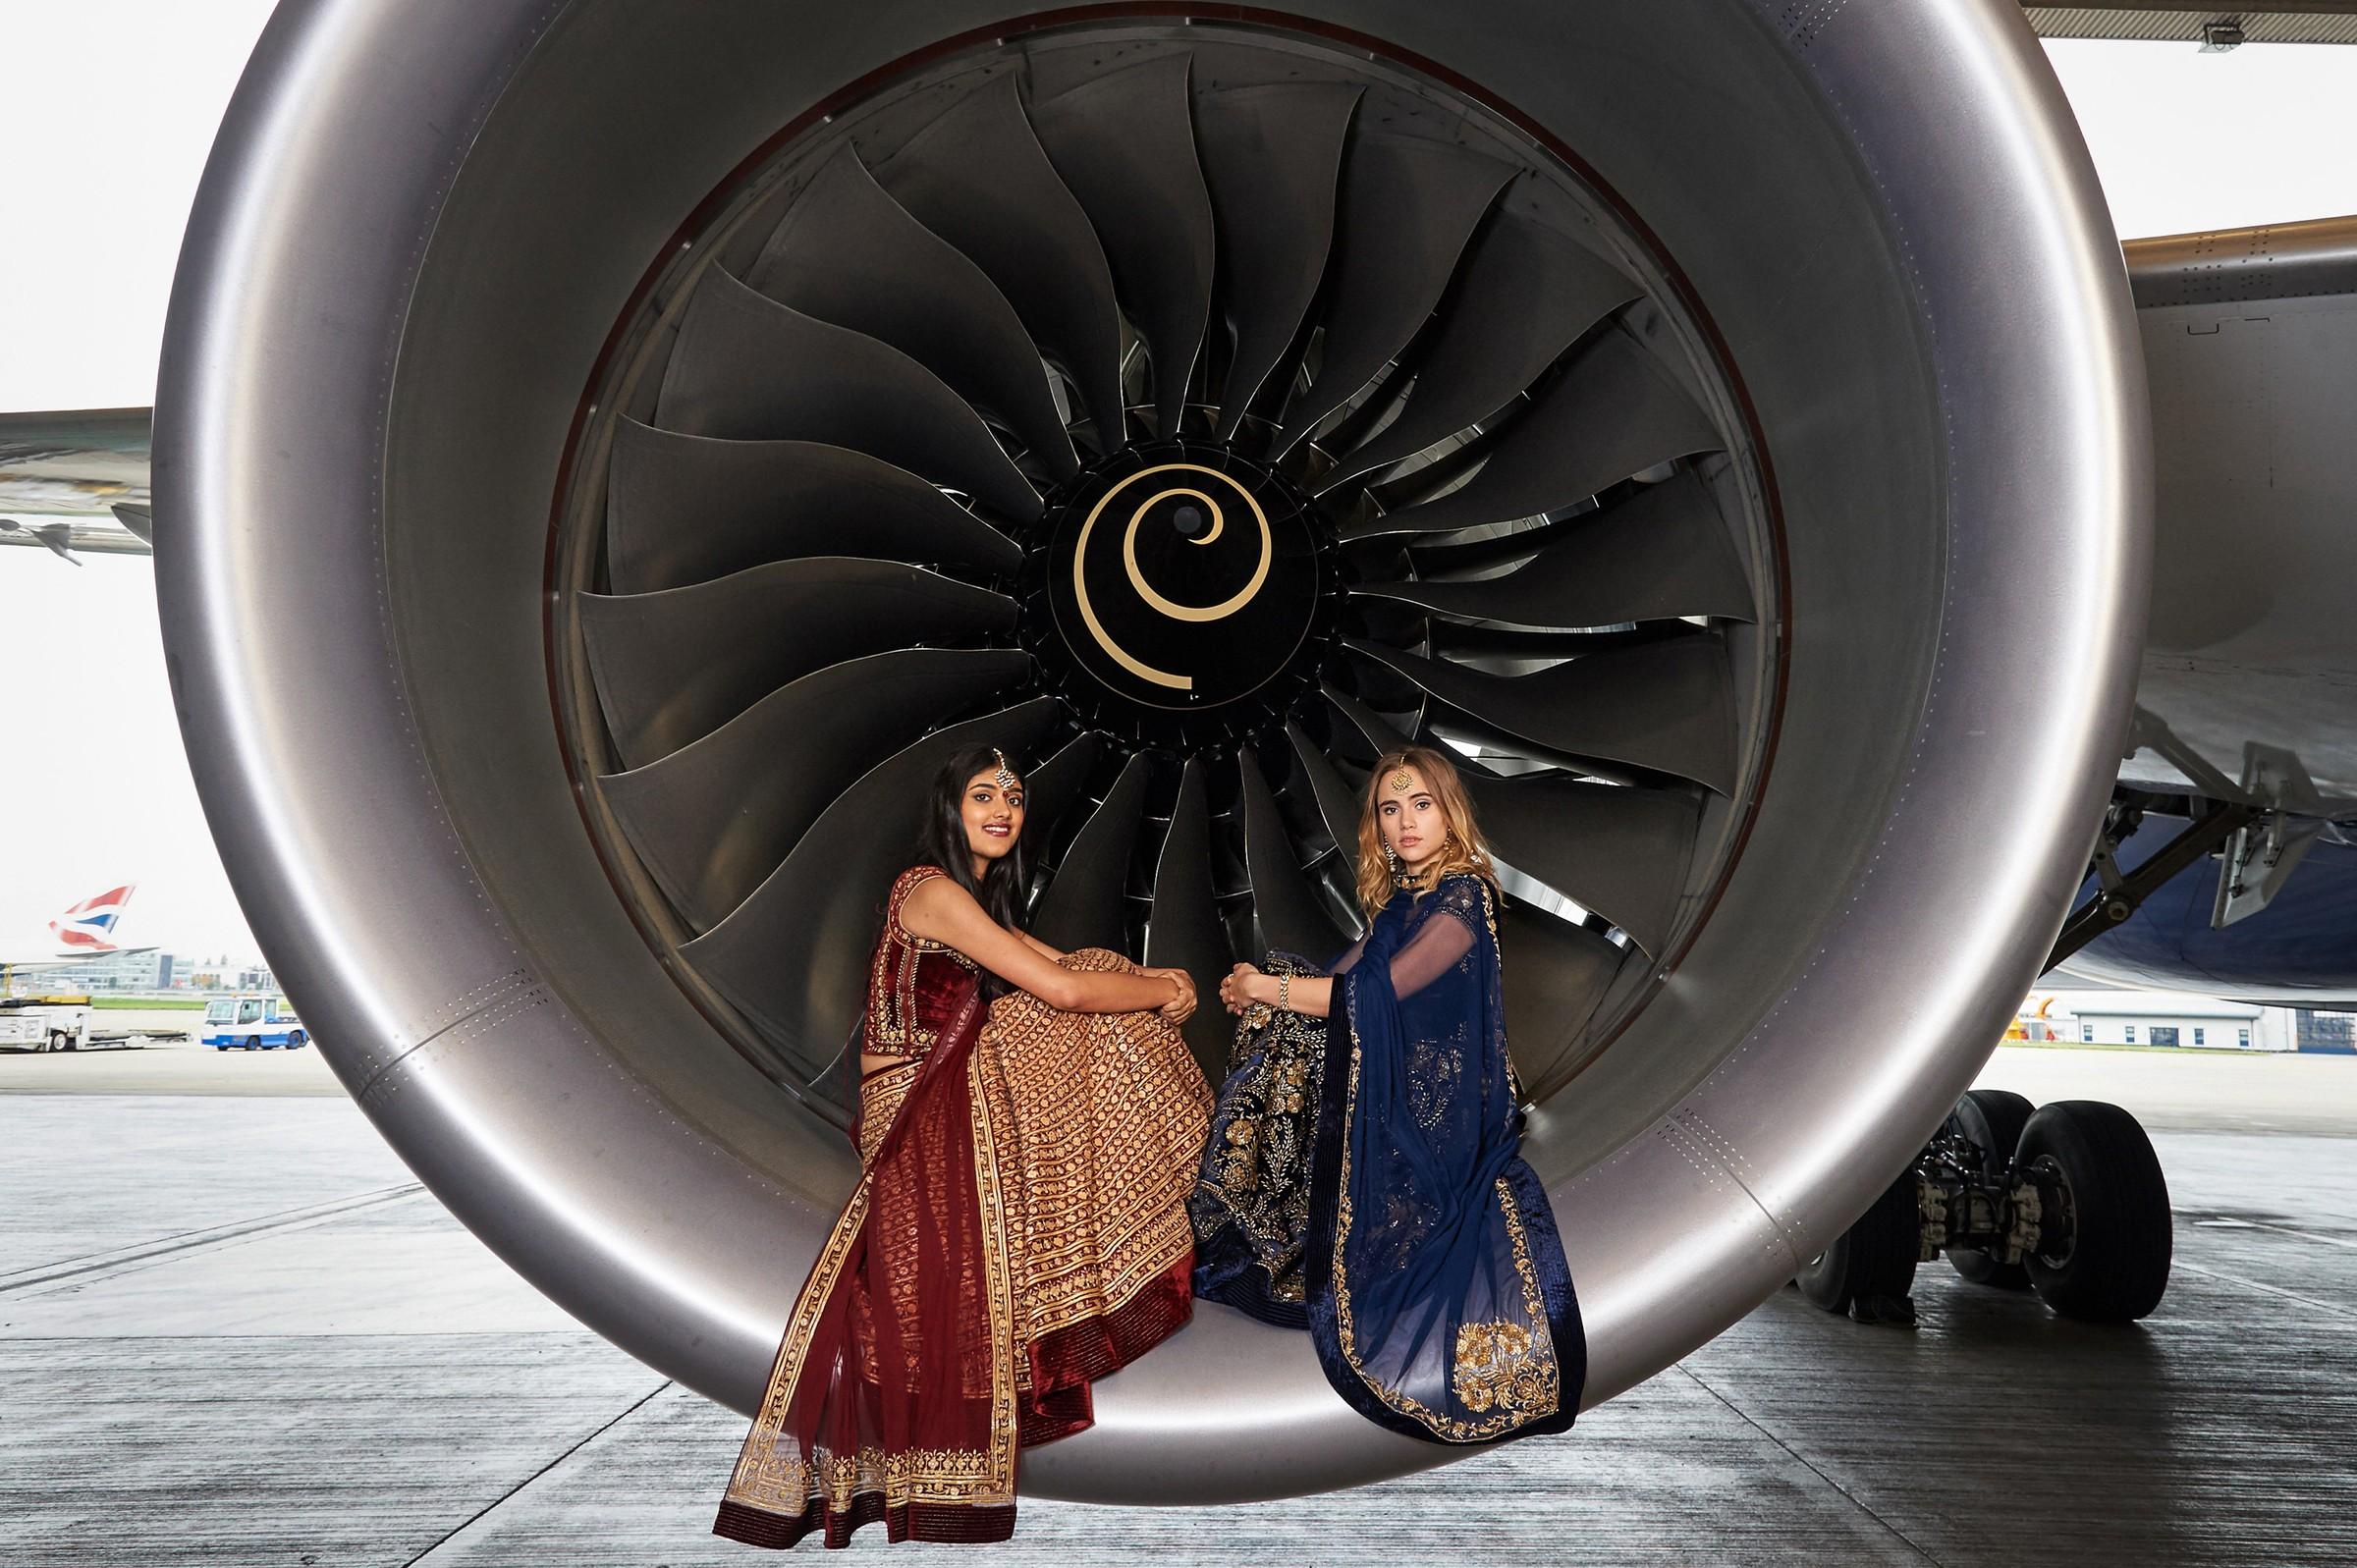 IAG Cargos new 787-9 takes off in Delhi